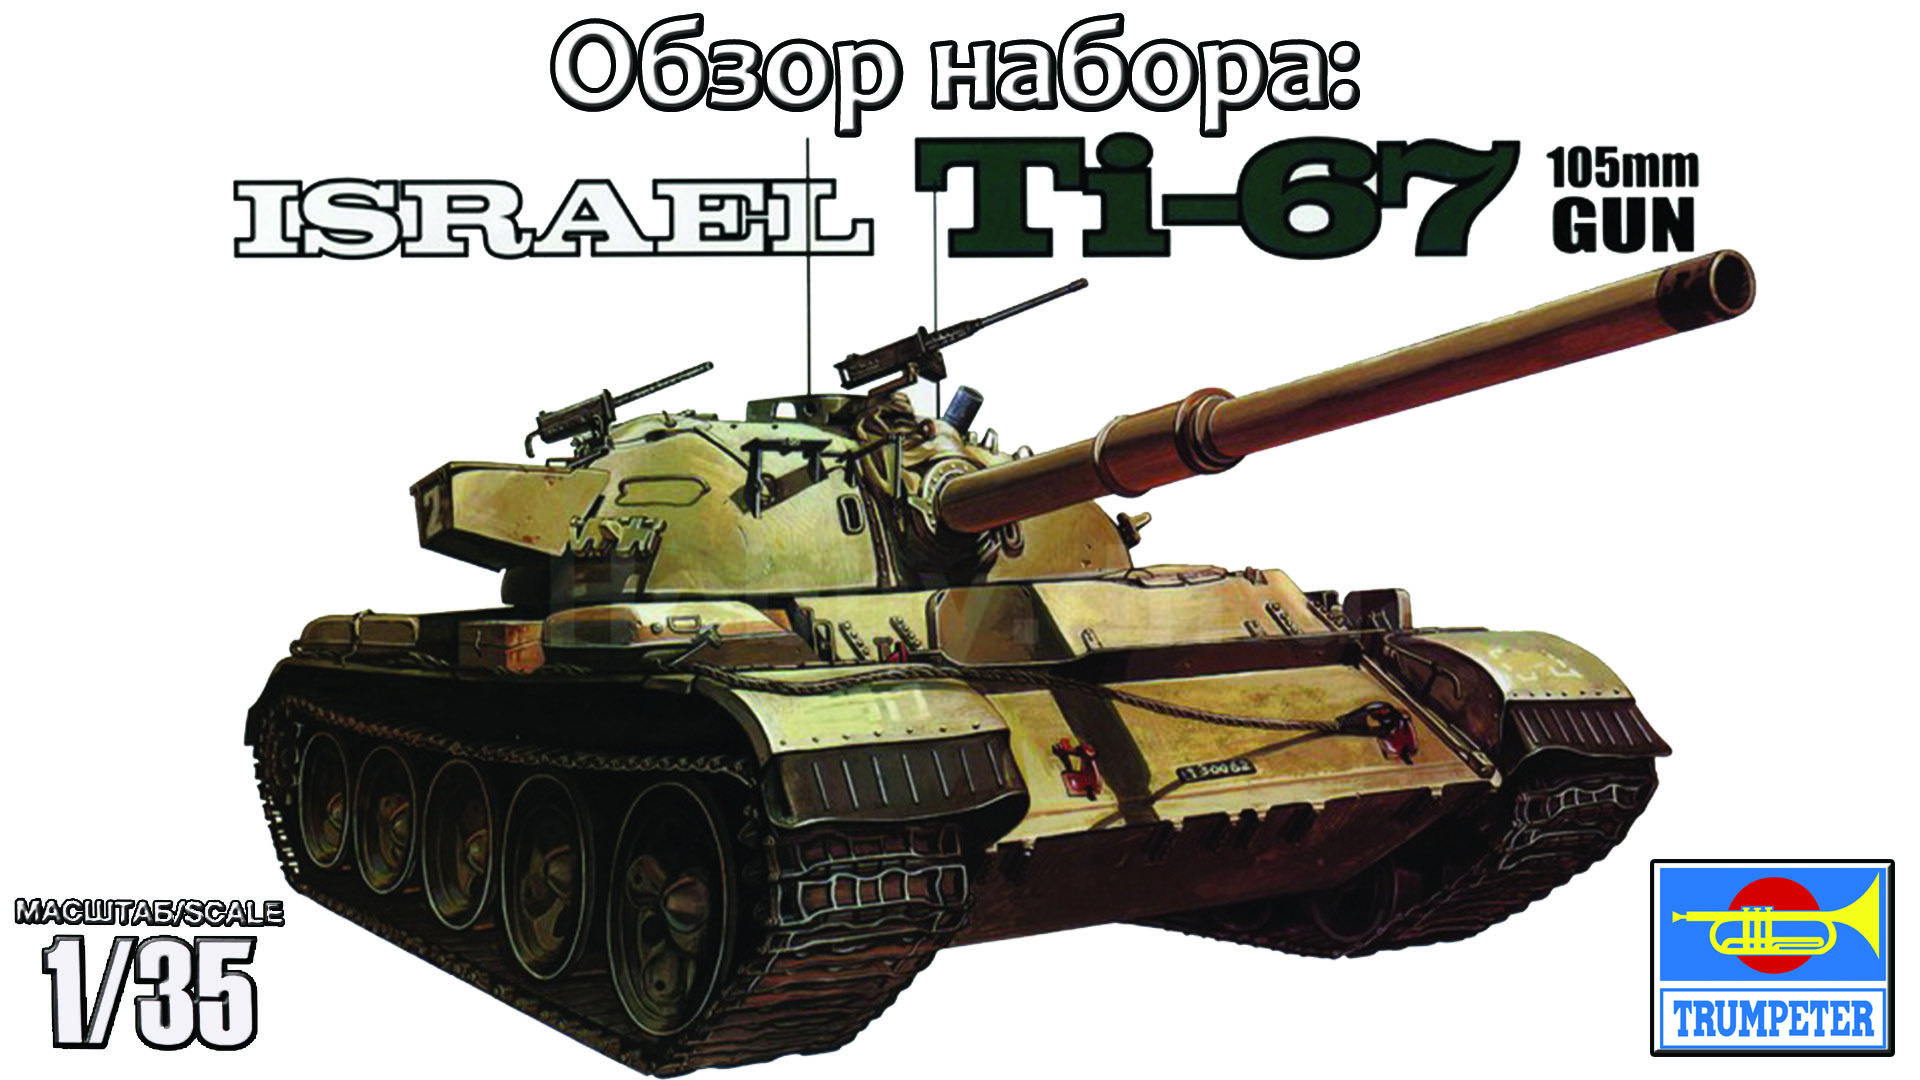 trumpeter_Ti-67